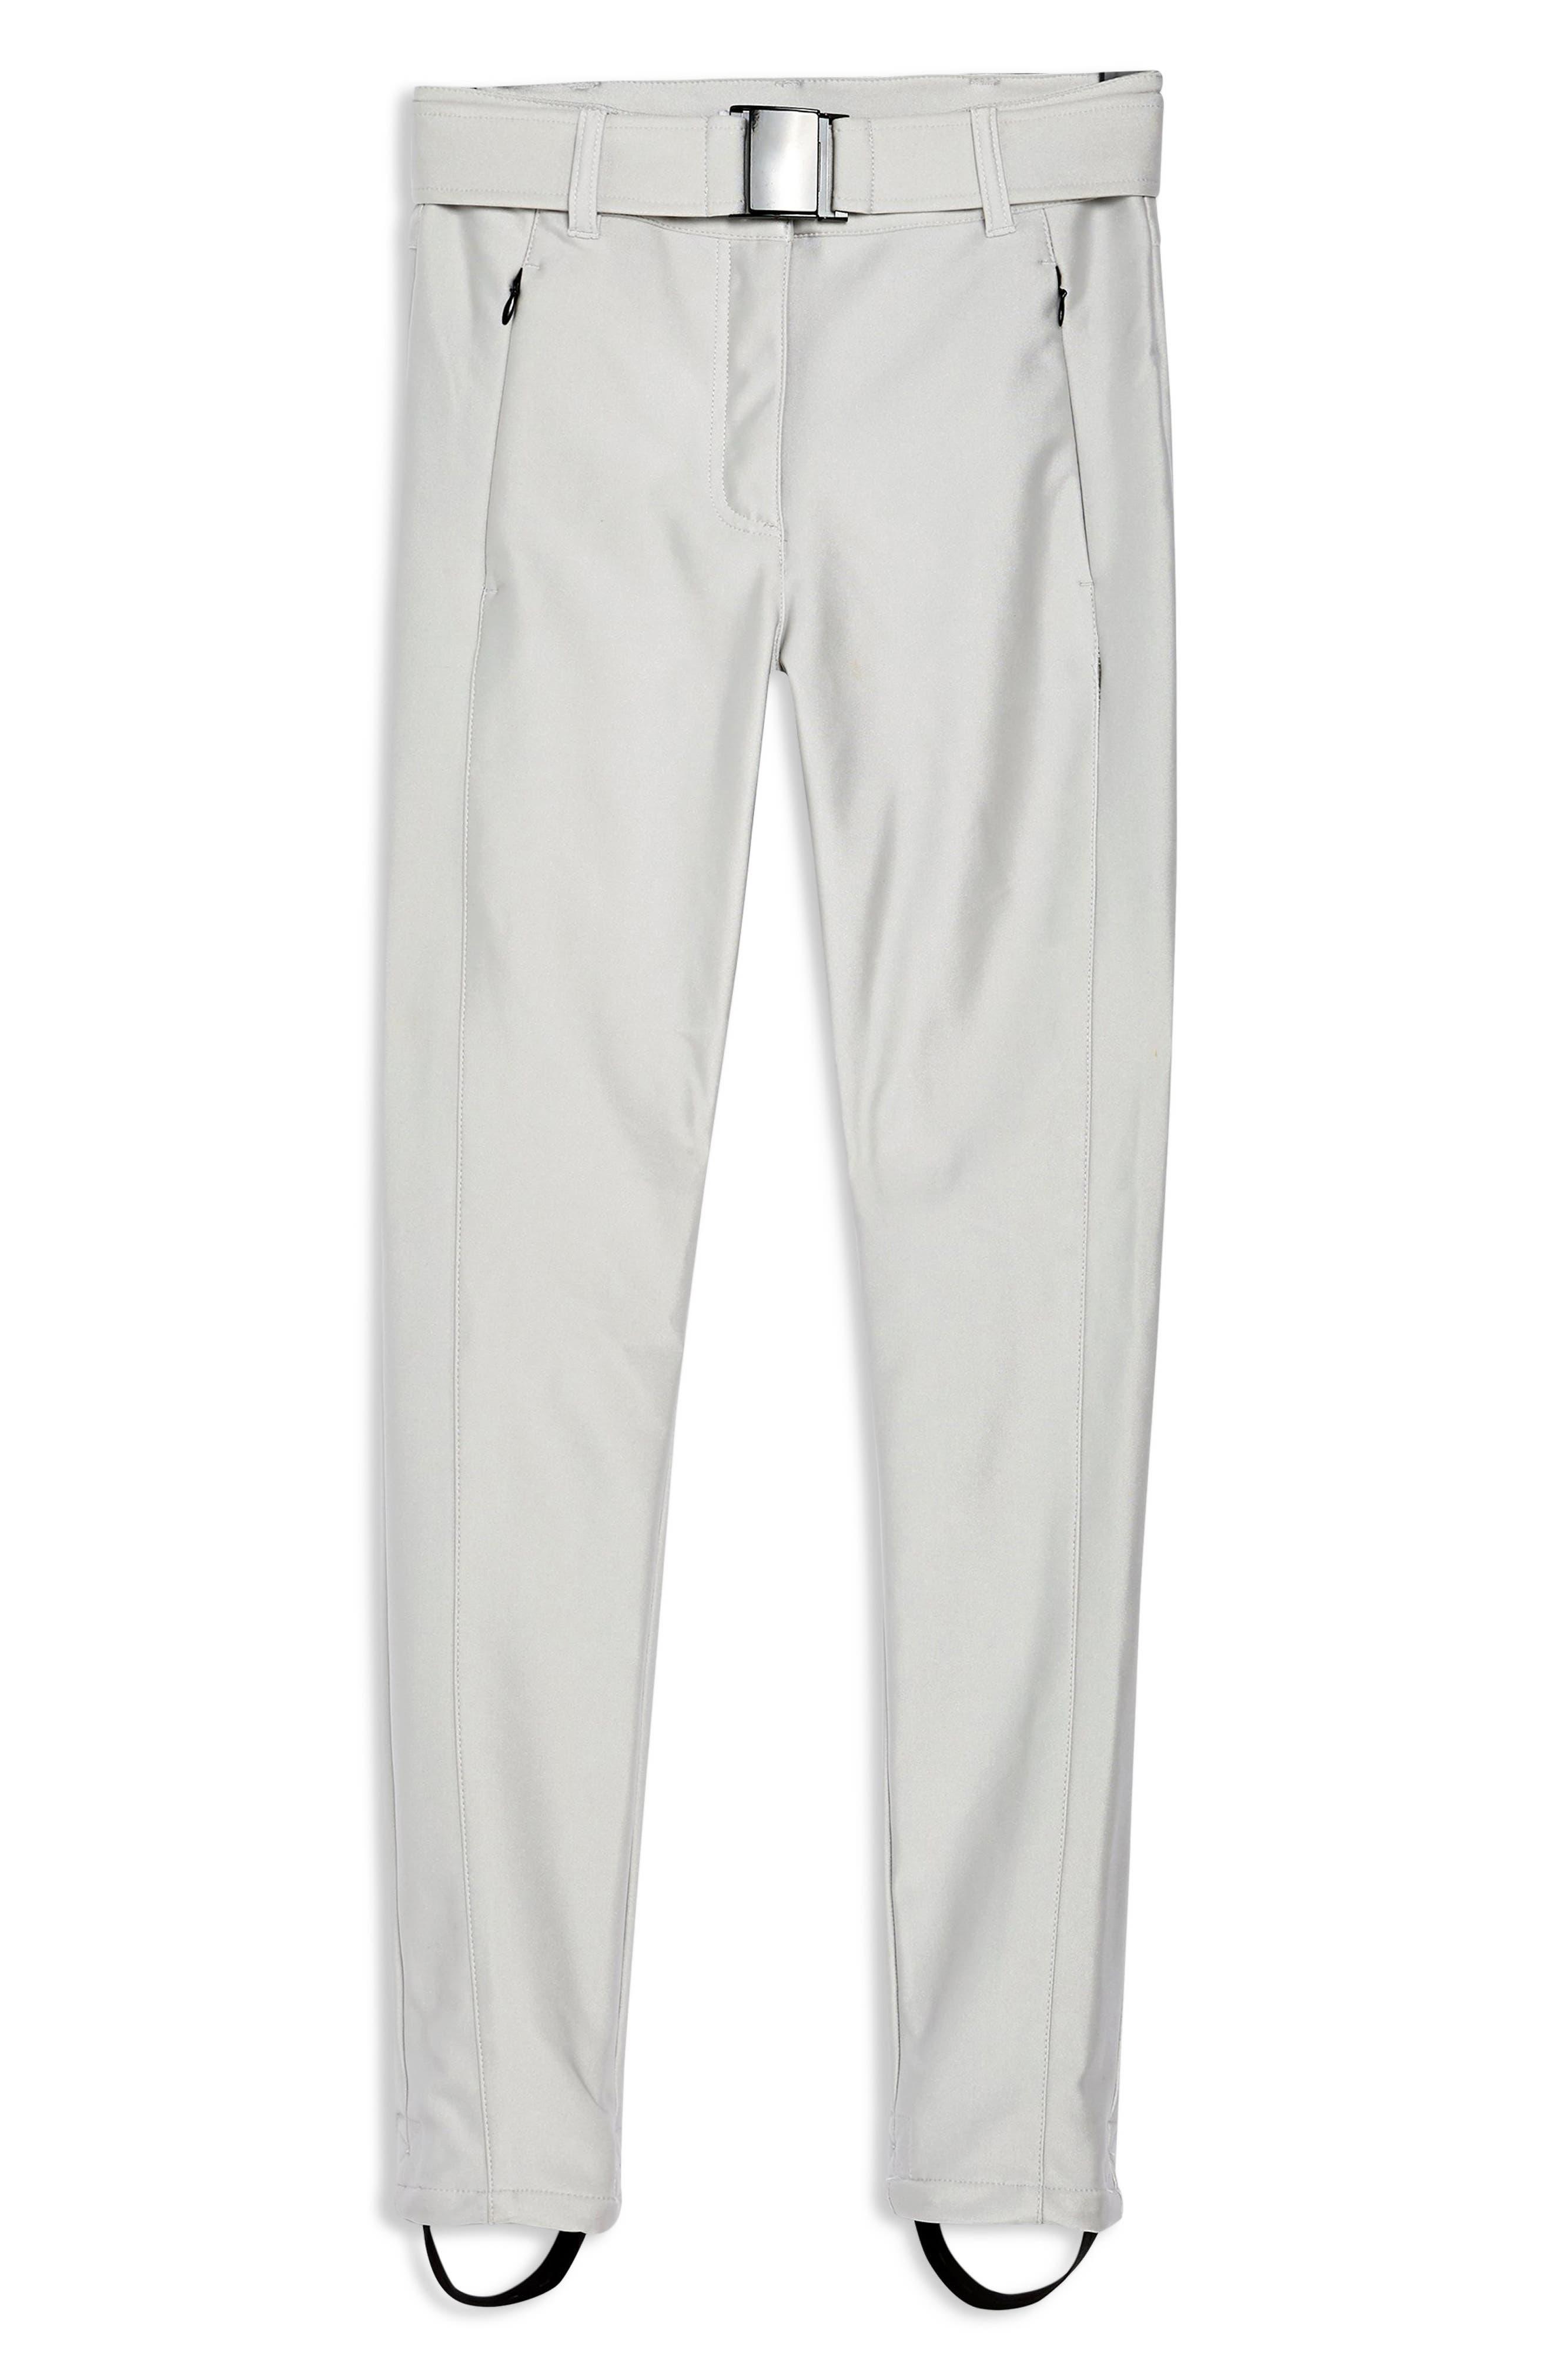 Sno Metallic Alanis Trousers,                             Alternate thumbnail 3, color,                             SILVER MULTI